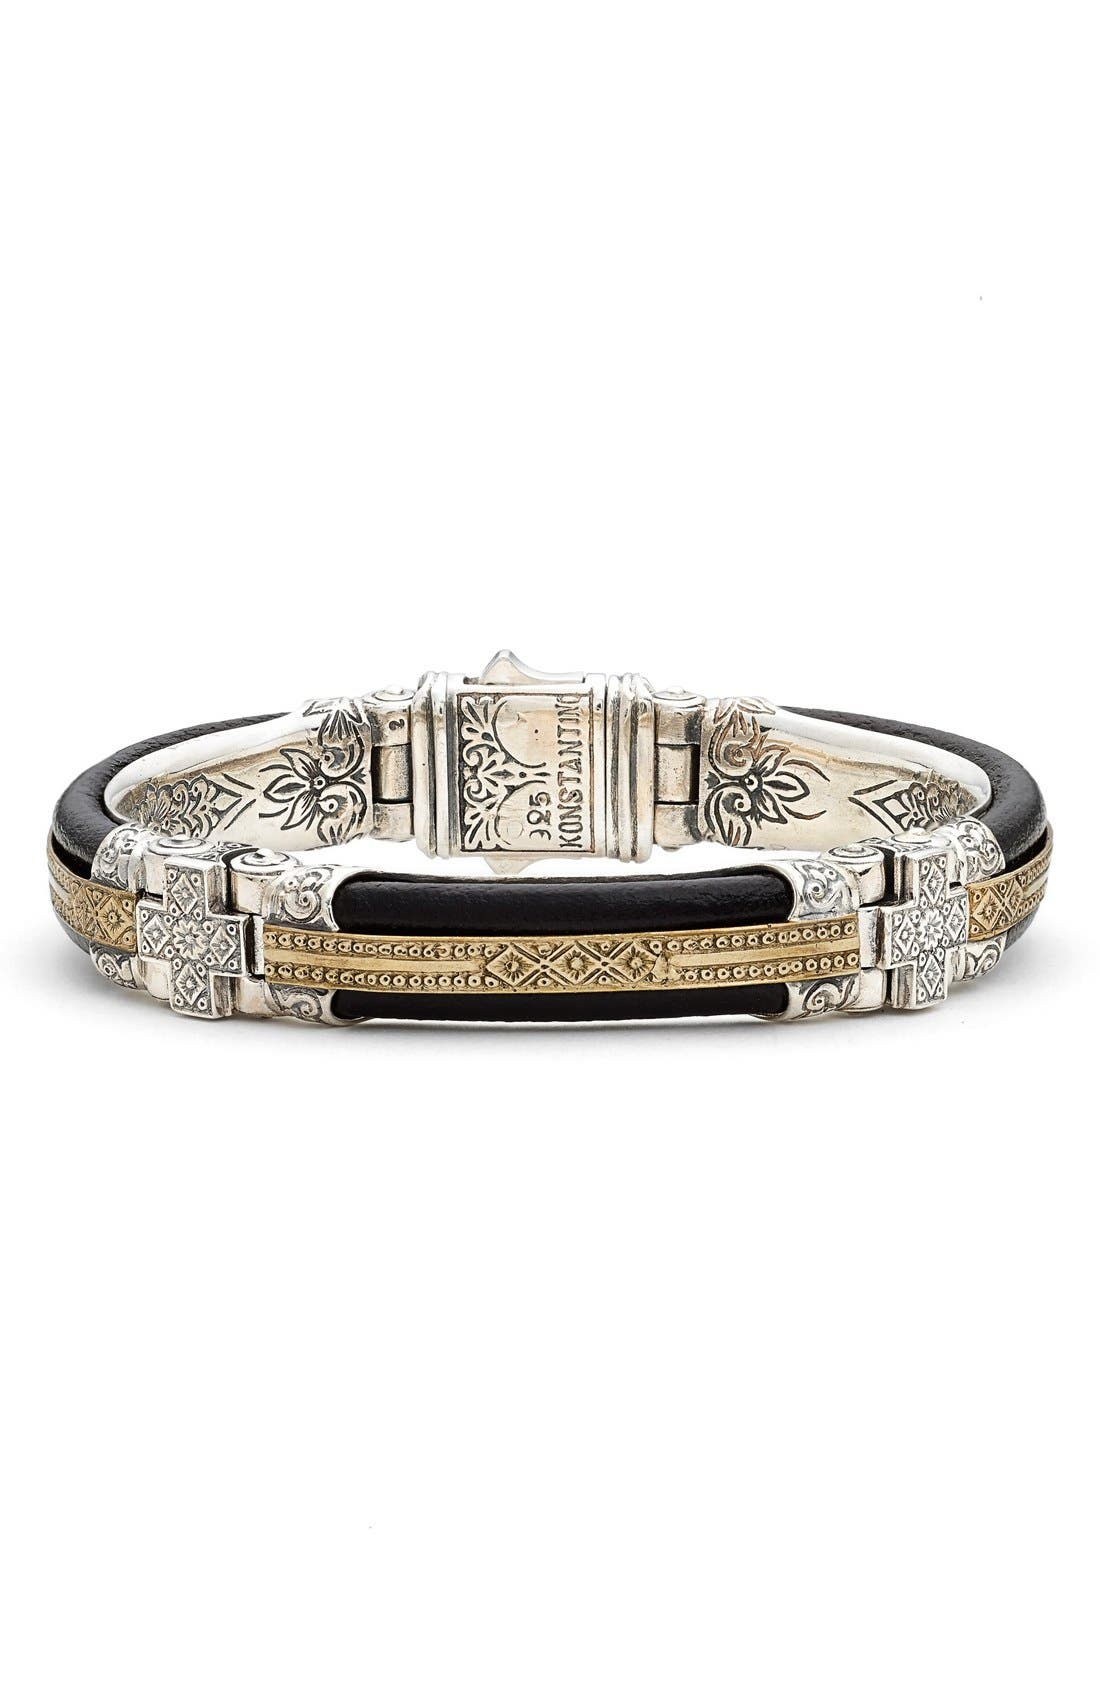 Main Image - Konstantino Byzantium Etched Sterling Silver Bracelet